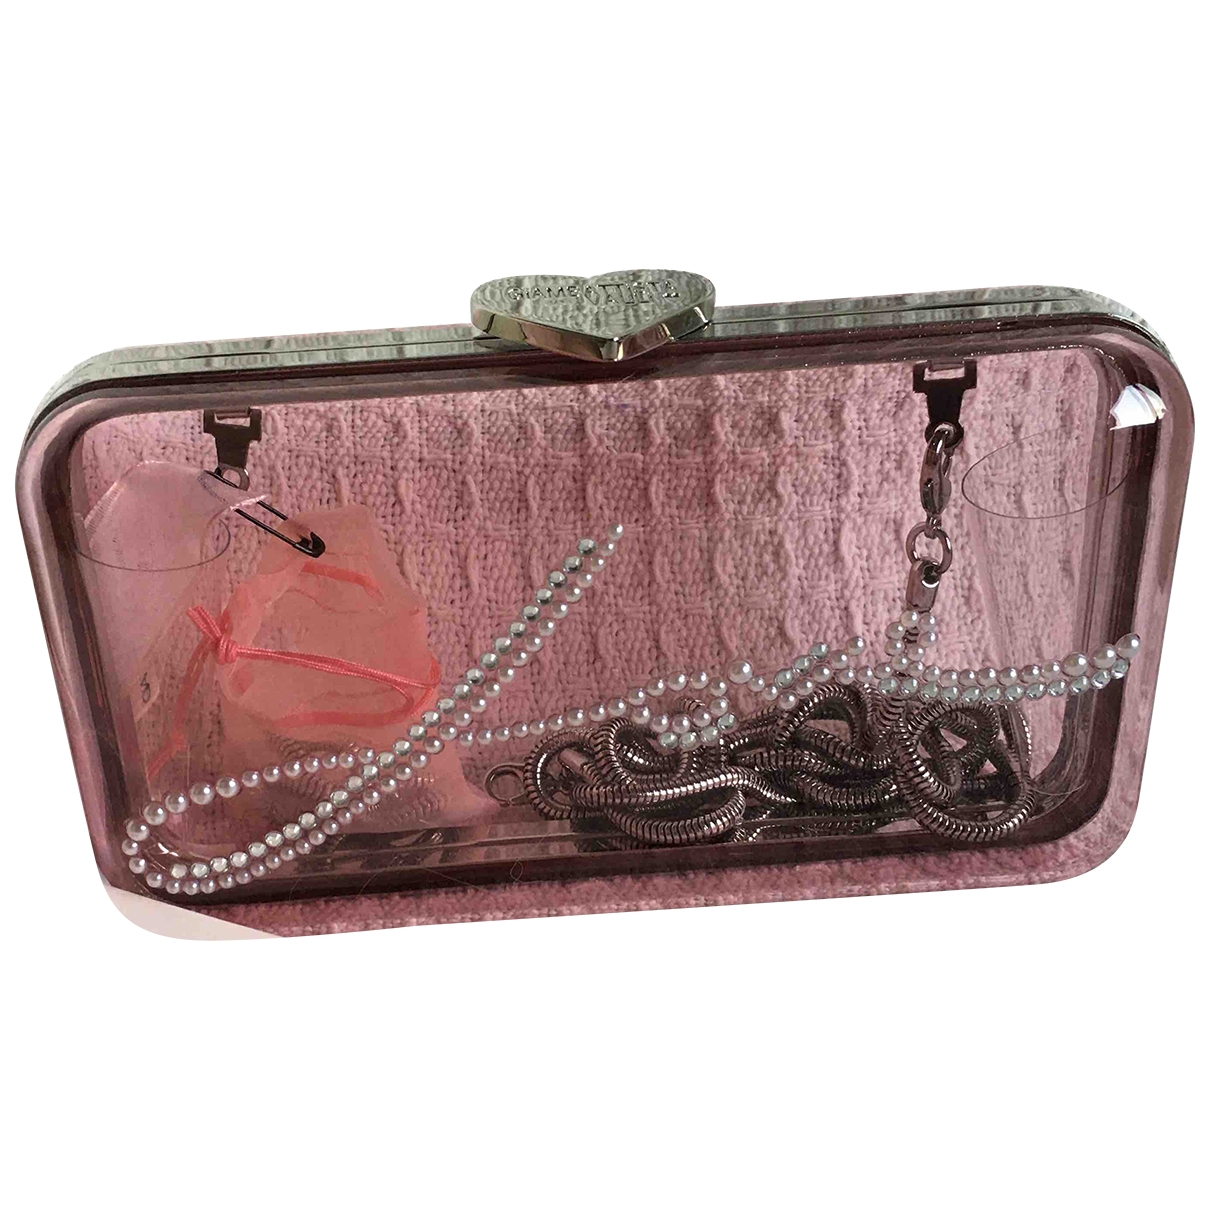 Giambattista Valli X H&m \N Pink handbag for Women \N